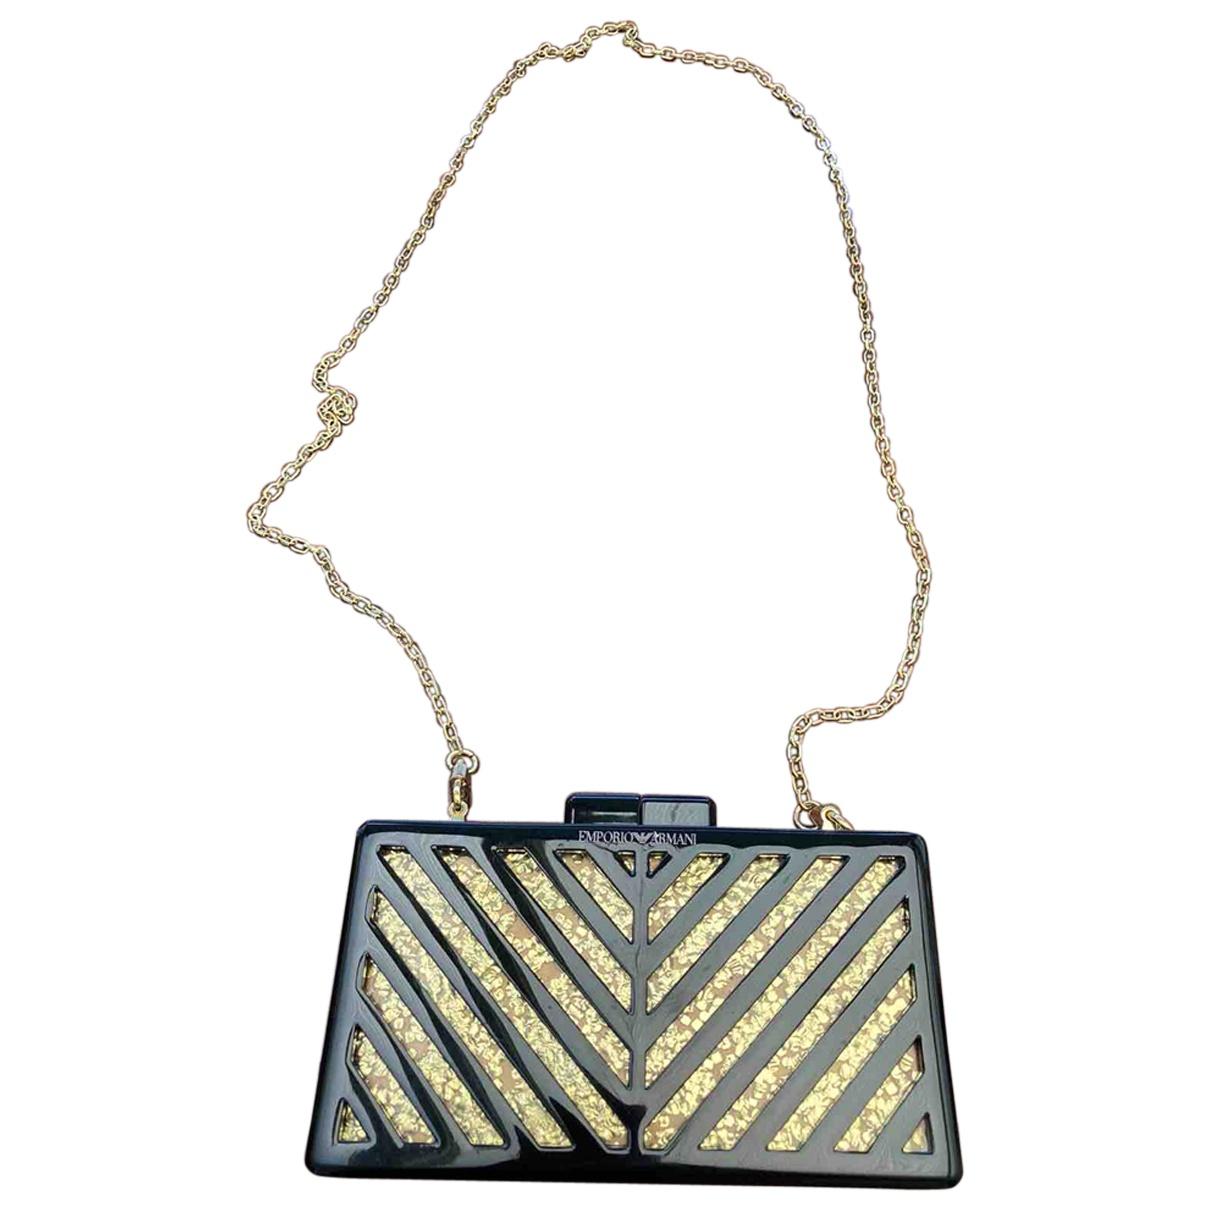 Emporio Armani N Black handbag for Women N